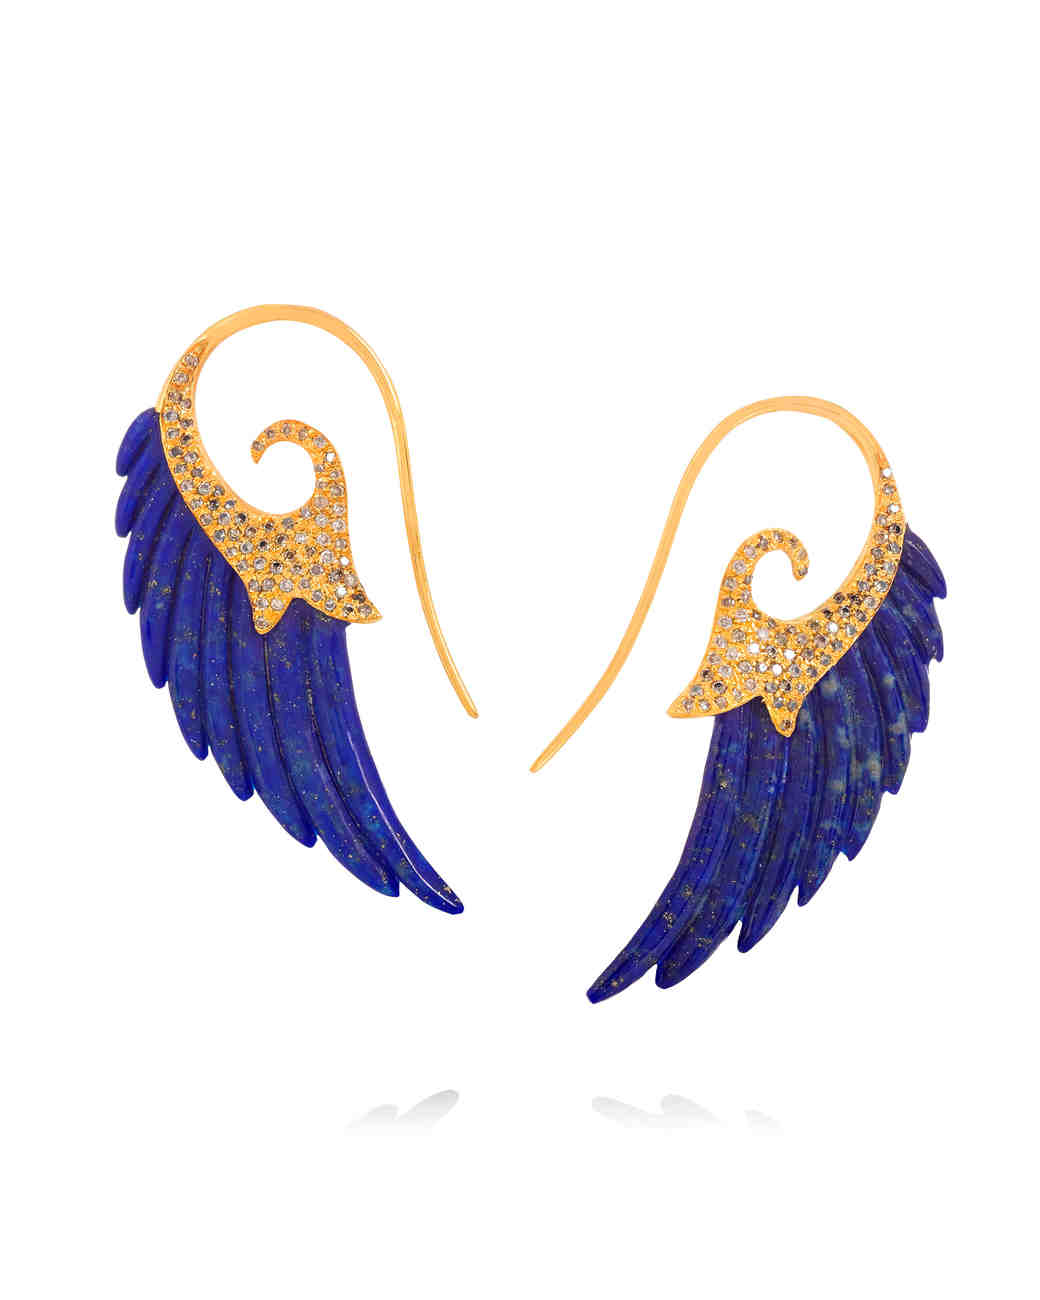 something-blue-jewelry-noor-fares-nap-1215.jpg